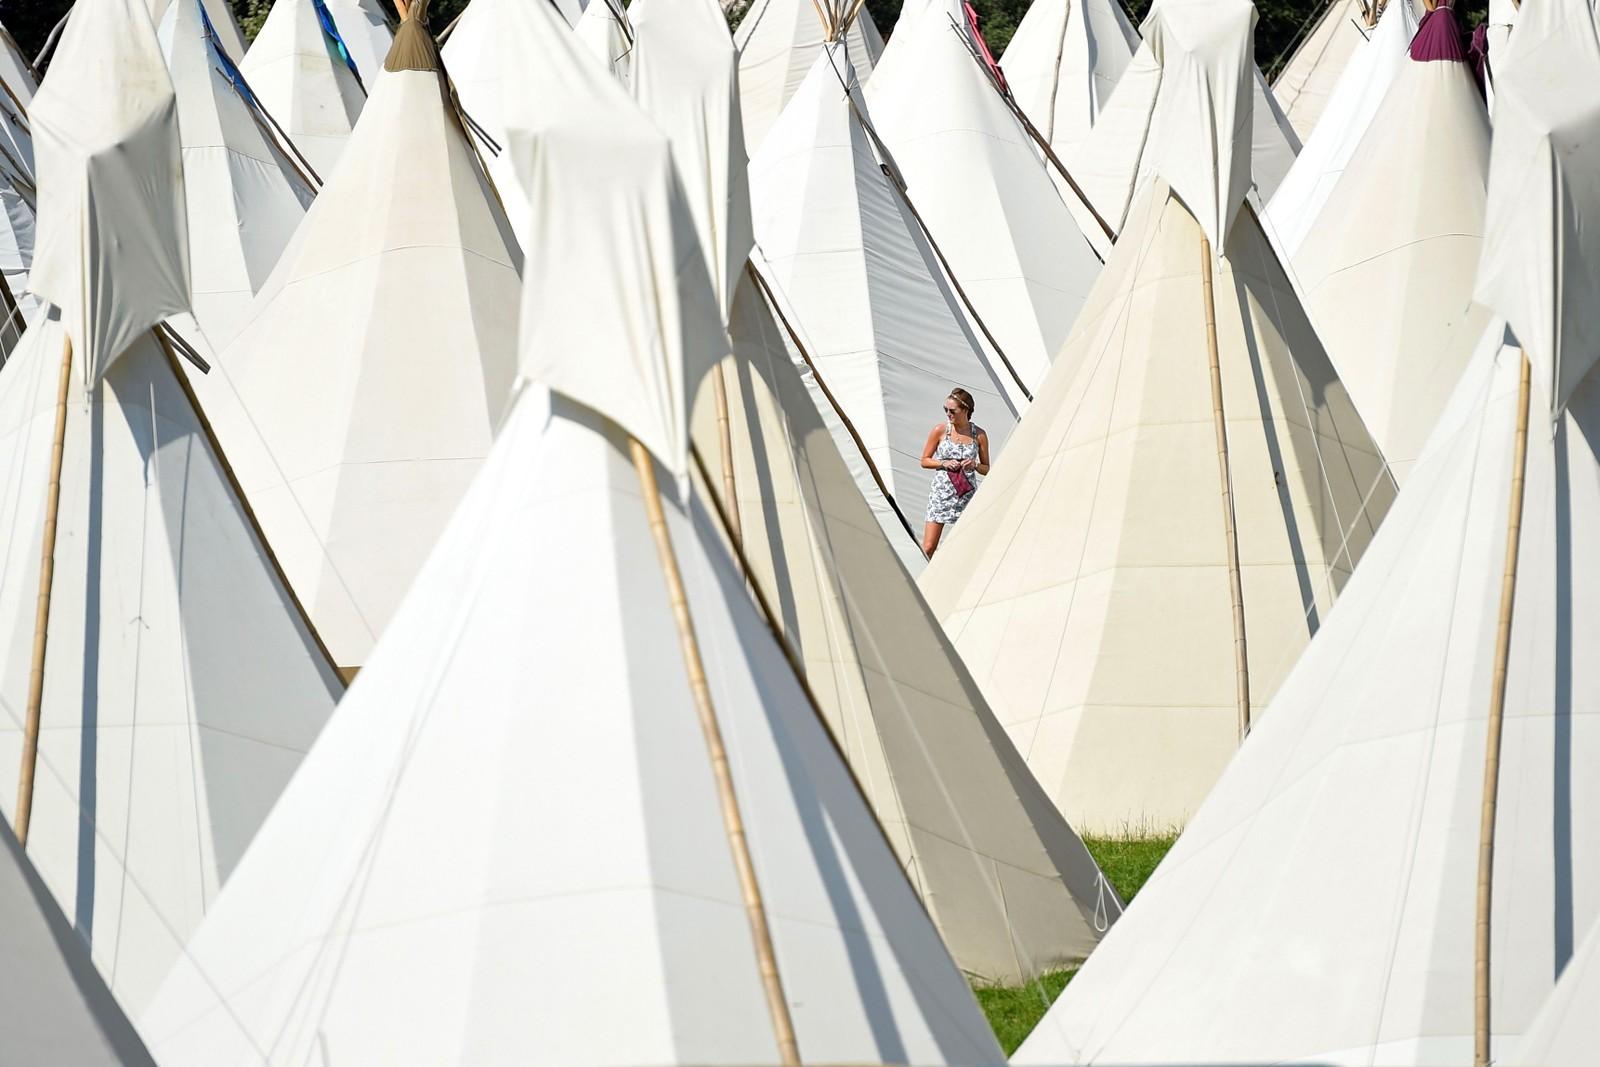 Teltjungel på musikkfestivalen Glastonbury i England.